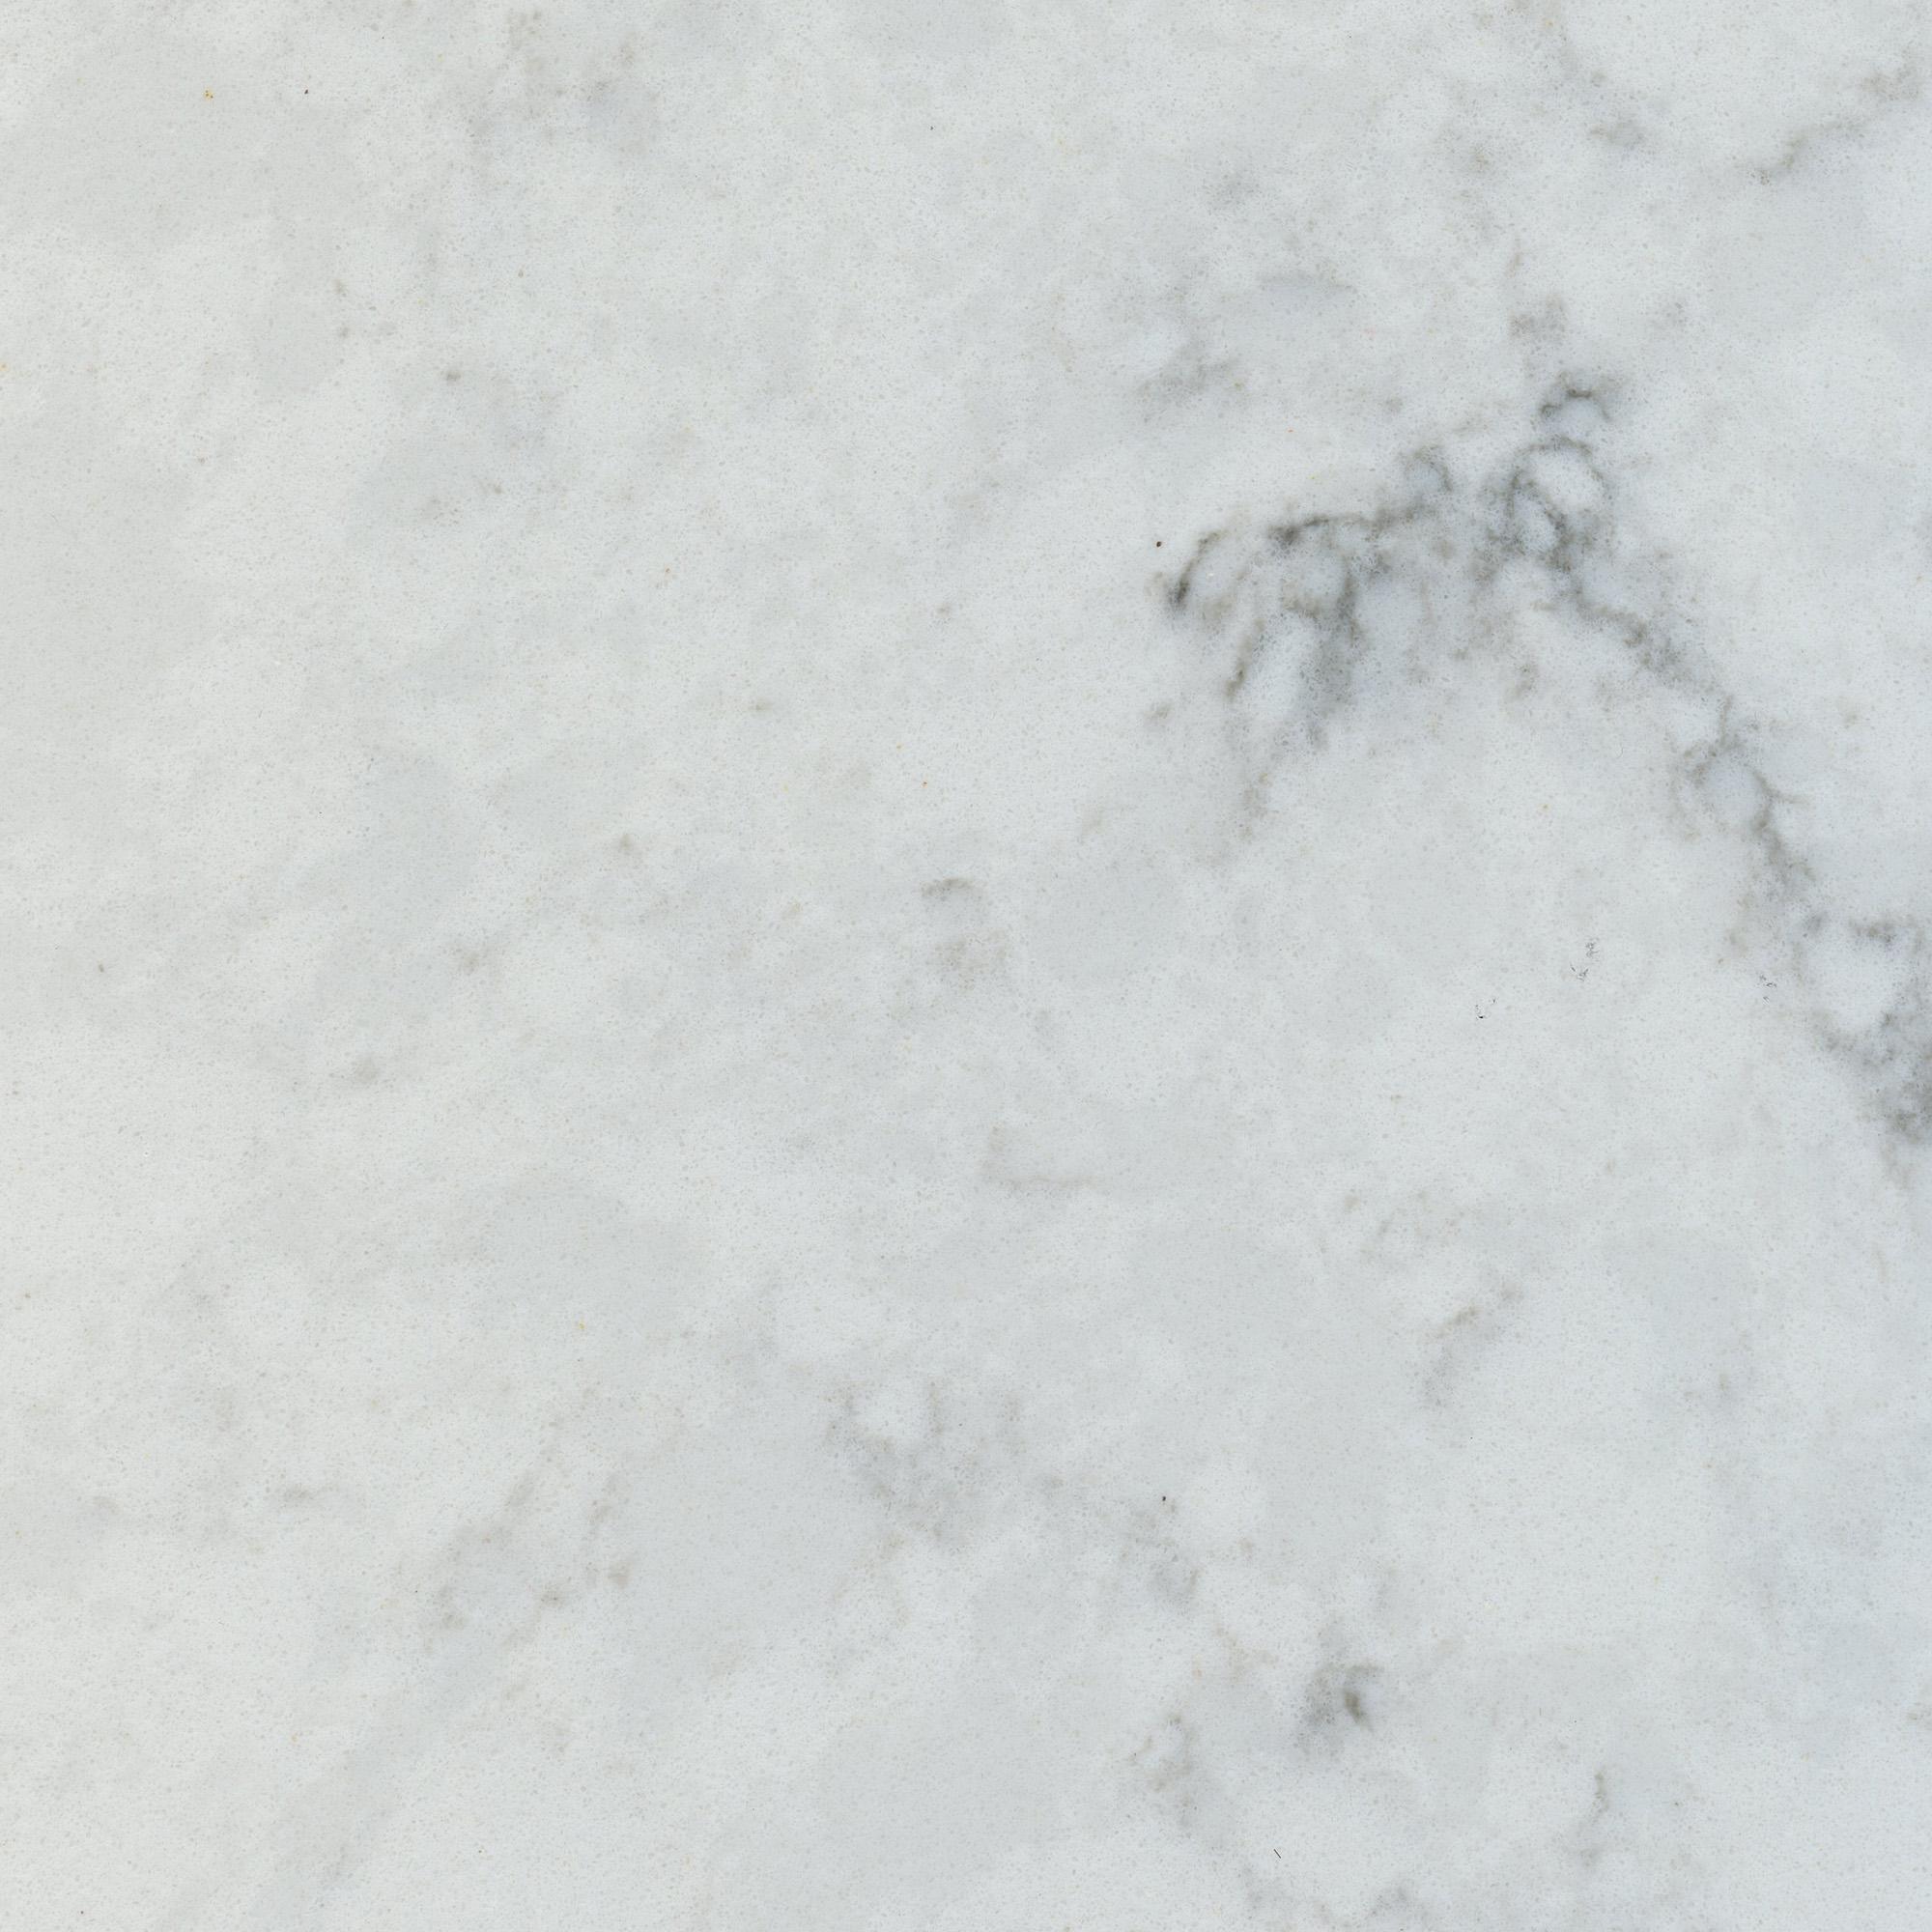 Klondike Avalanche